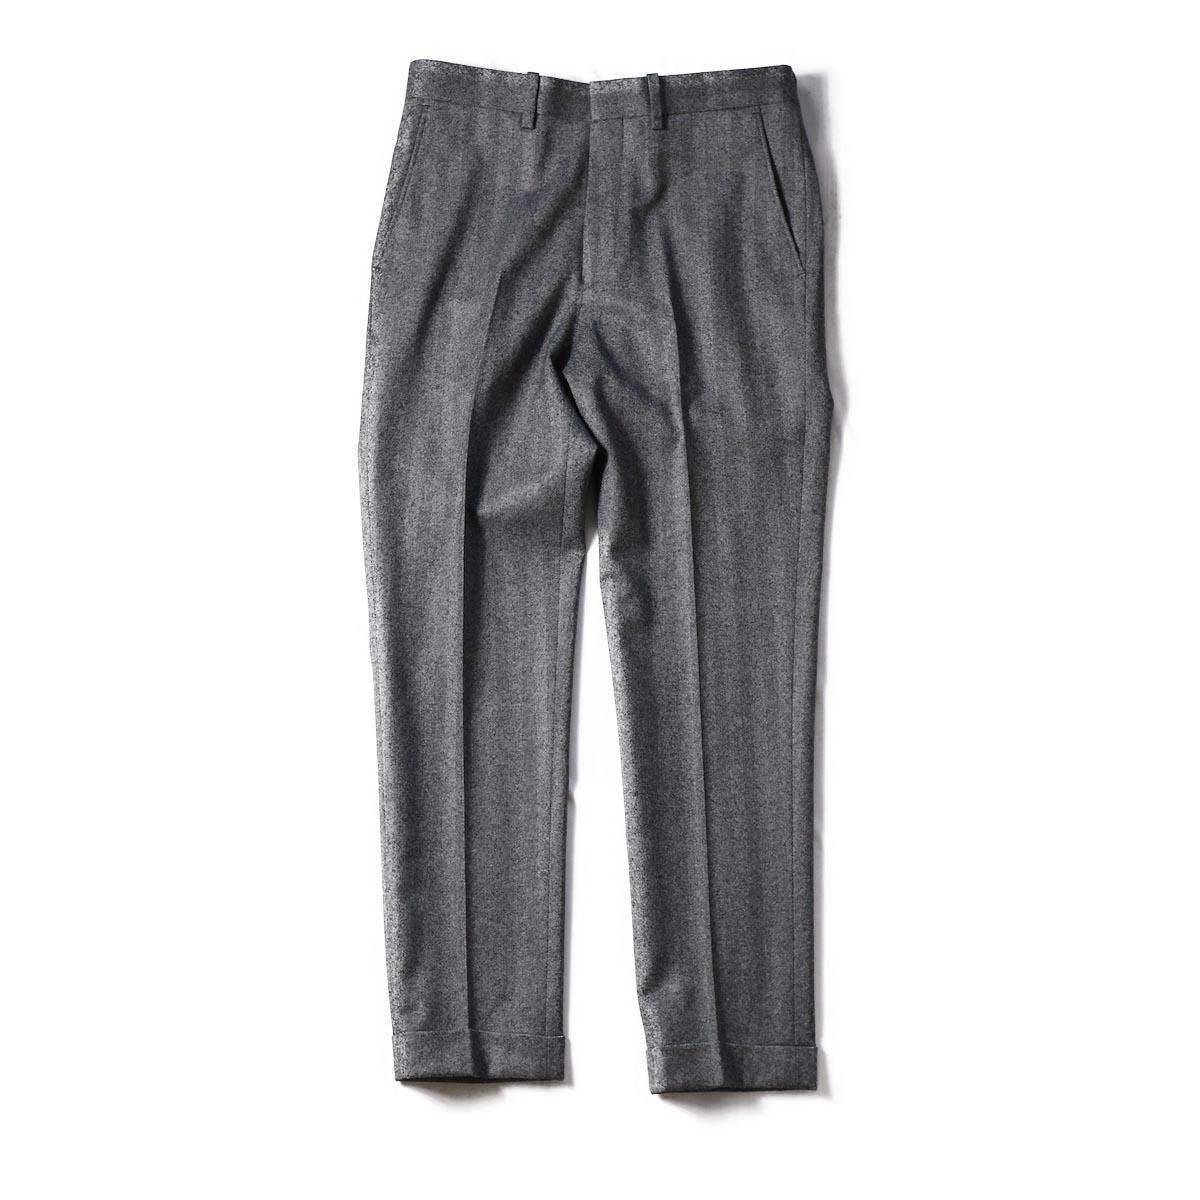 N.HOOLYWOOD /182-PT02-027-pieces HB SLIM SLACKS -Gray